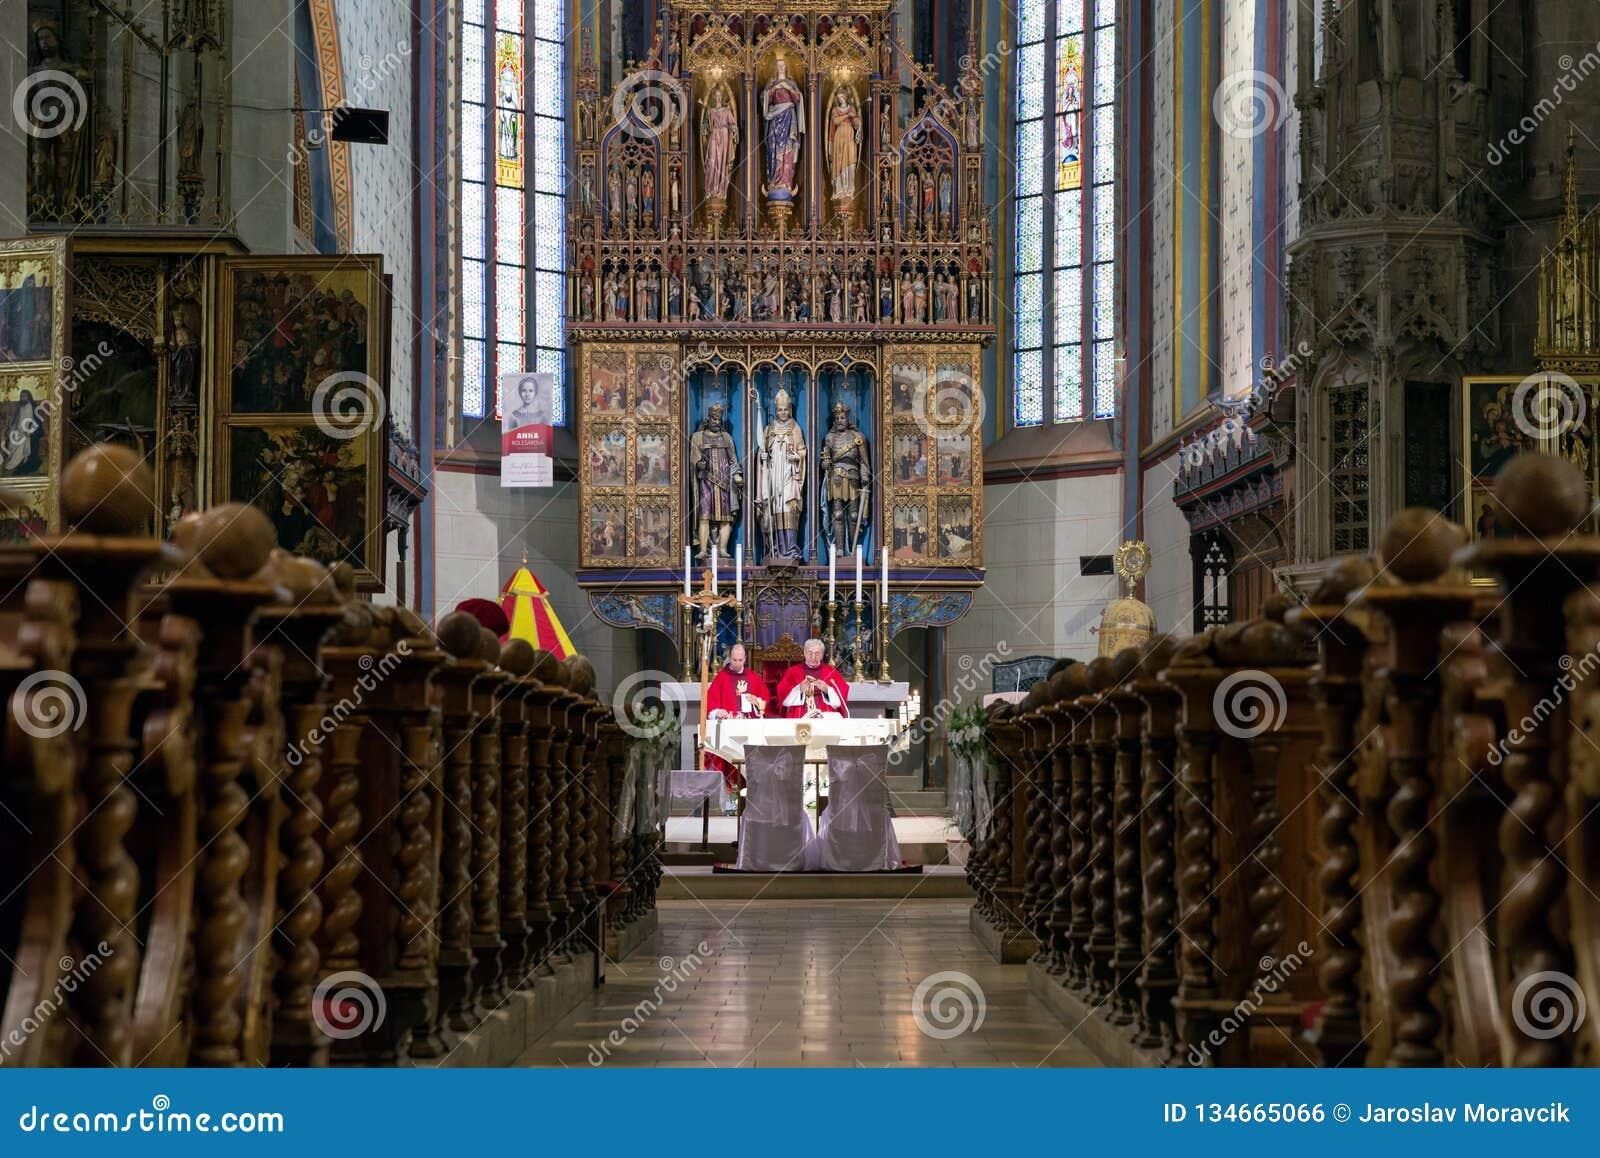 Massa na igreja Católica, Bardejov - Eslováquia